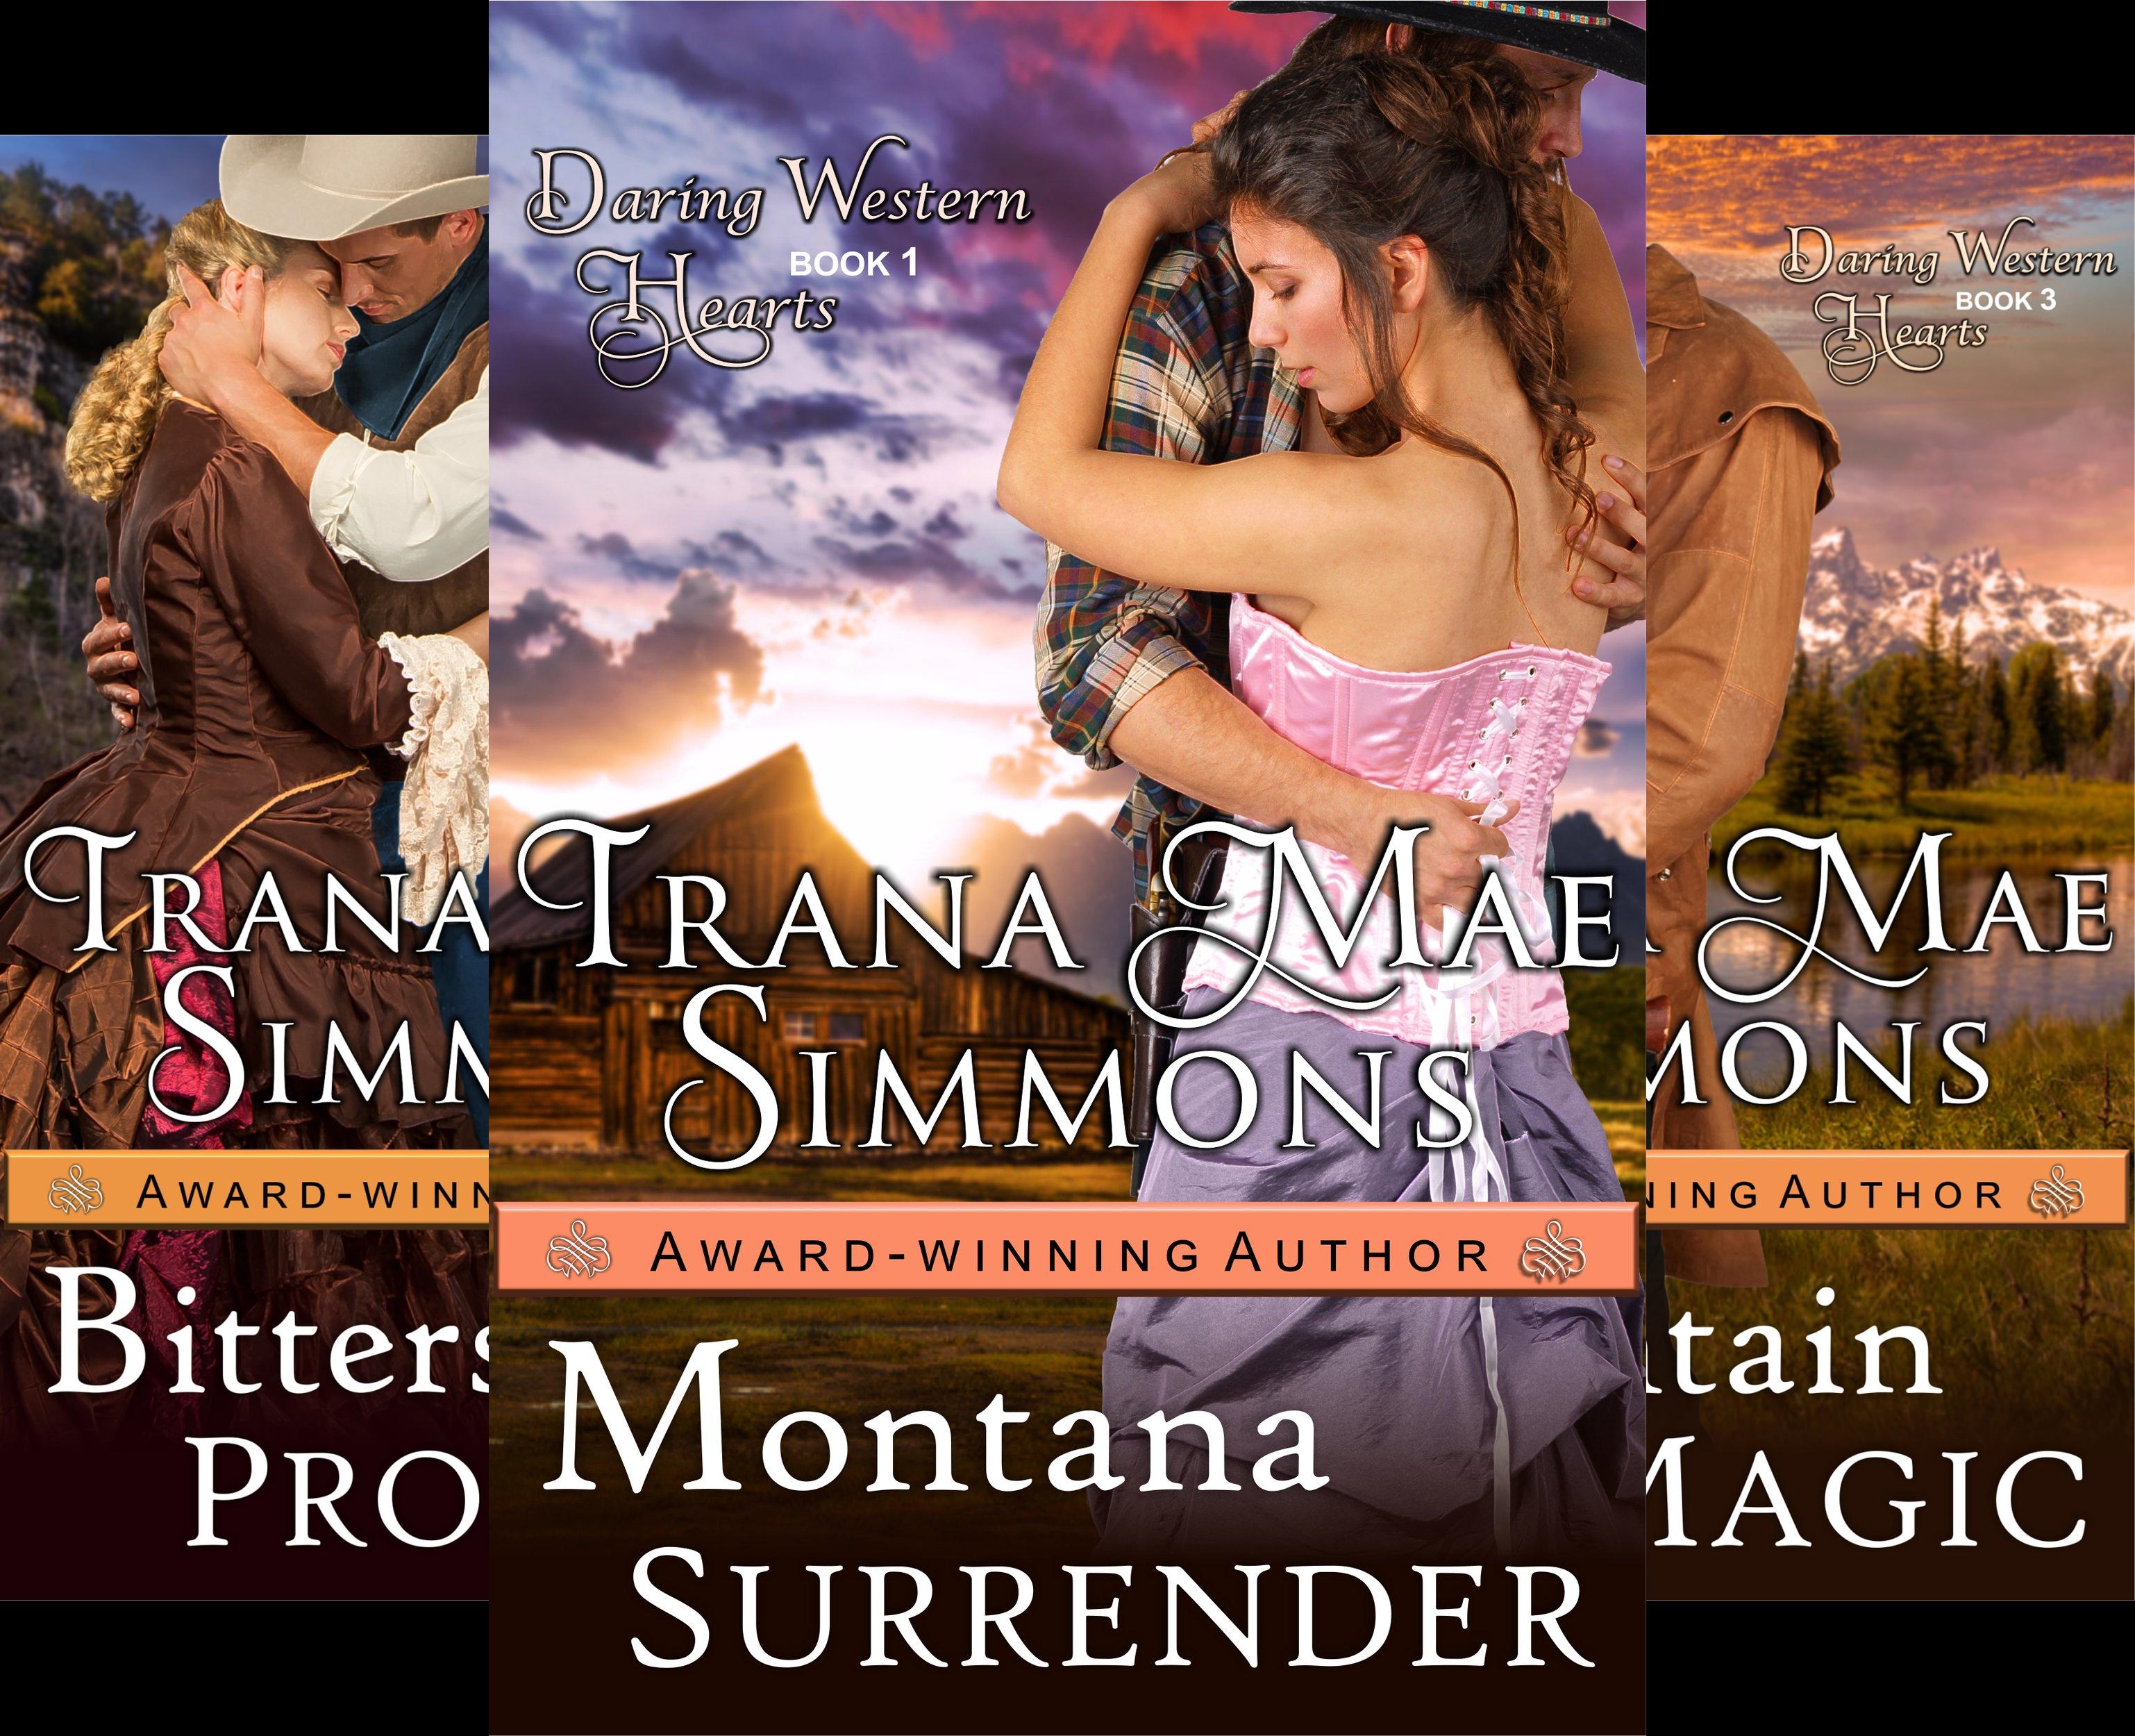 Daring Western Hearts (3 Book Series)